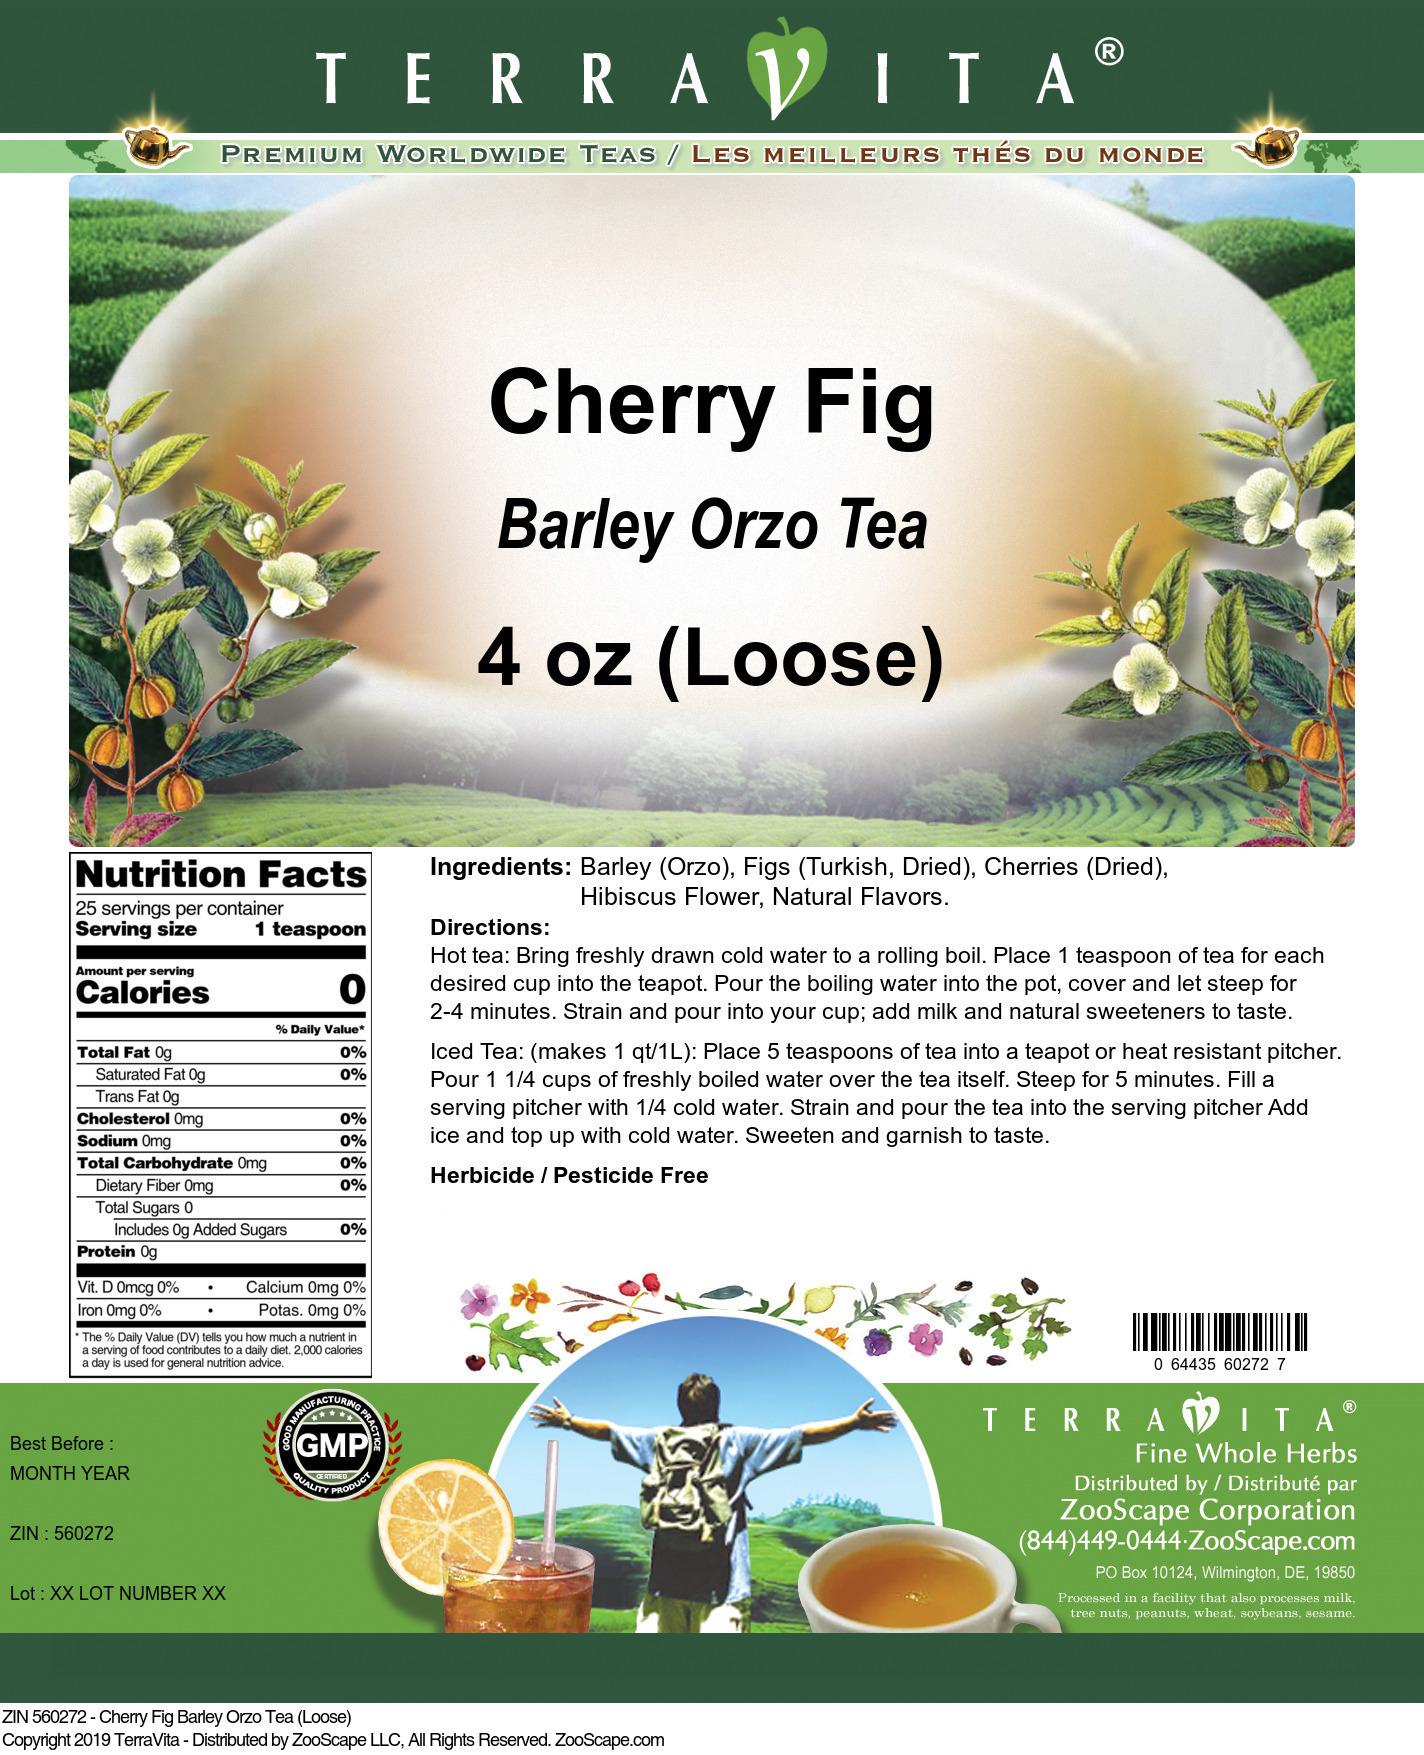 Cherry Fig Barley Orzo Tea (Loose)